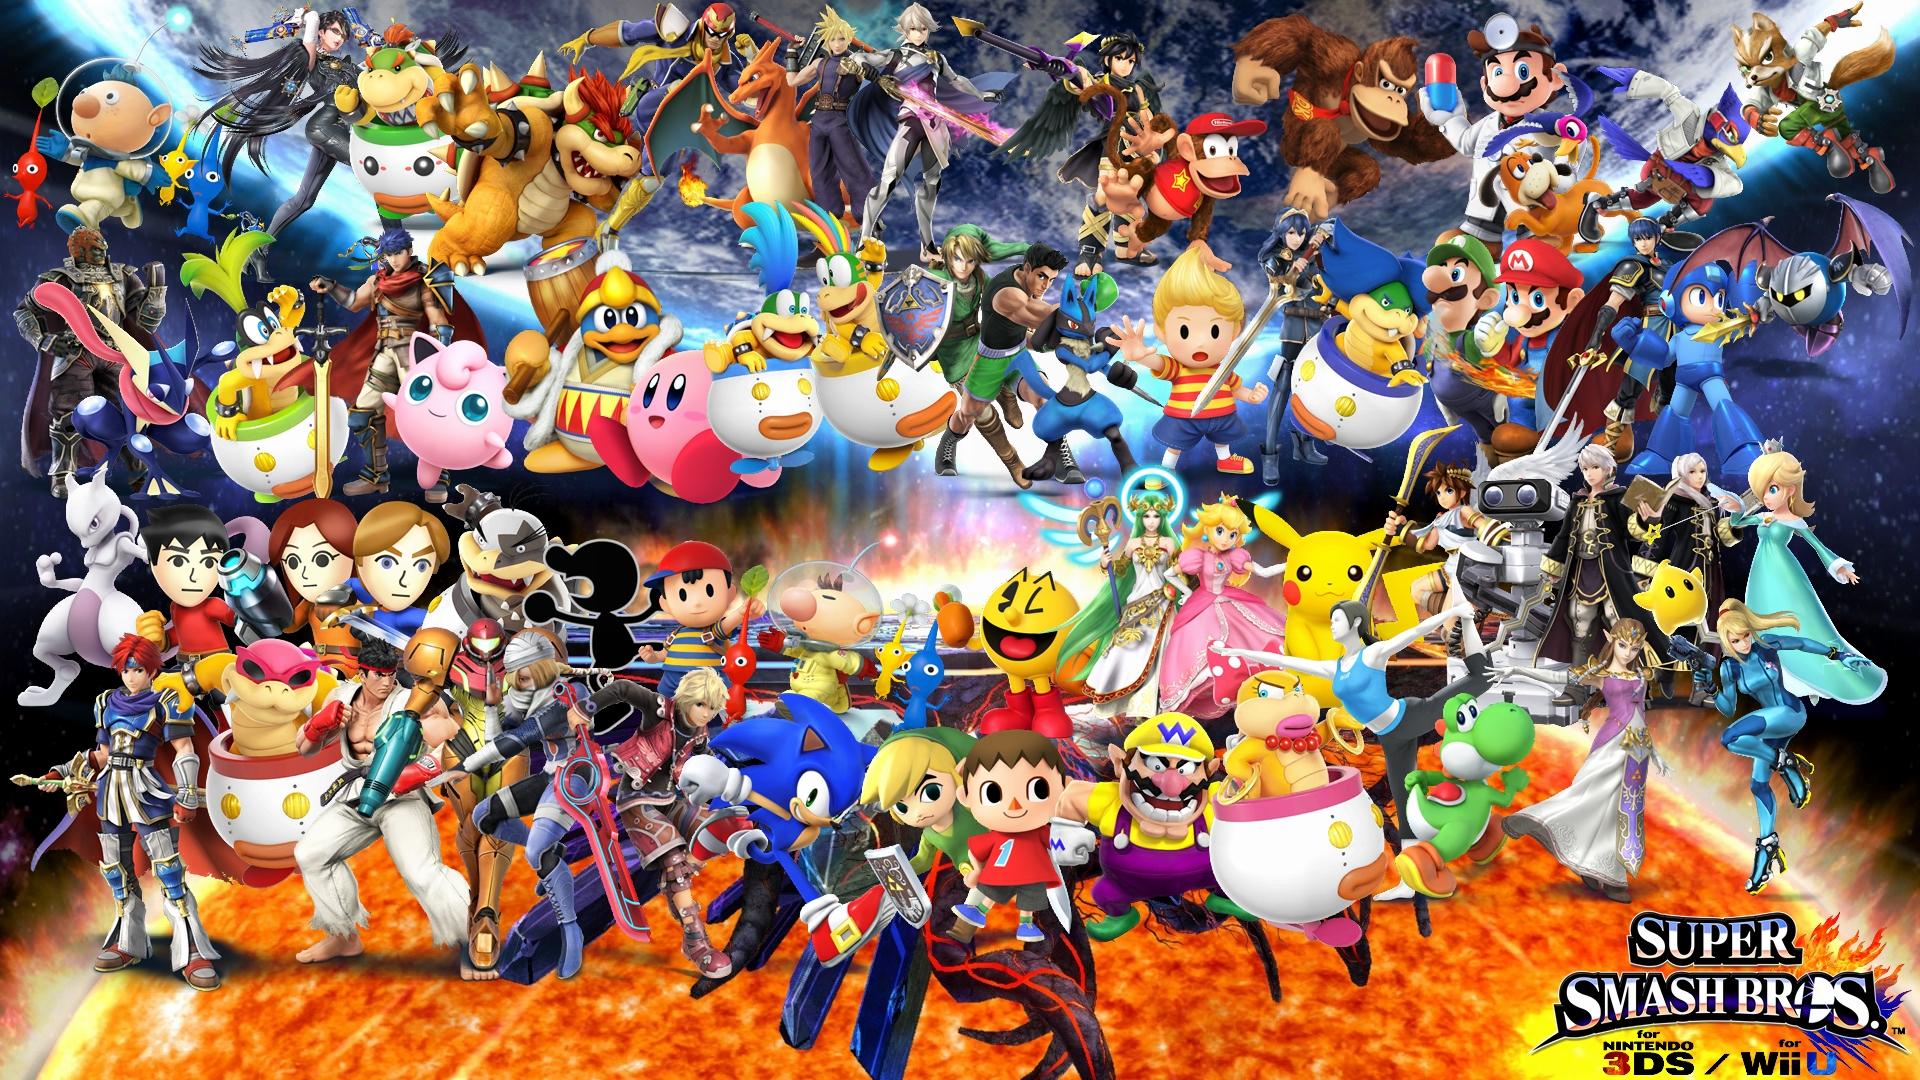 Free Download Super Smash Bros 4 Wallpaper By Yoink13 1920x1080